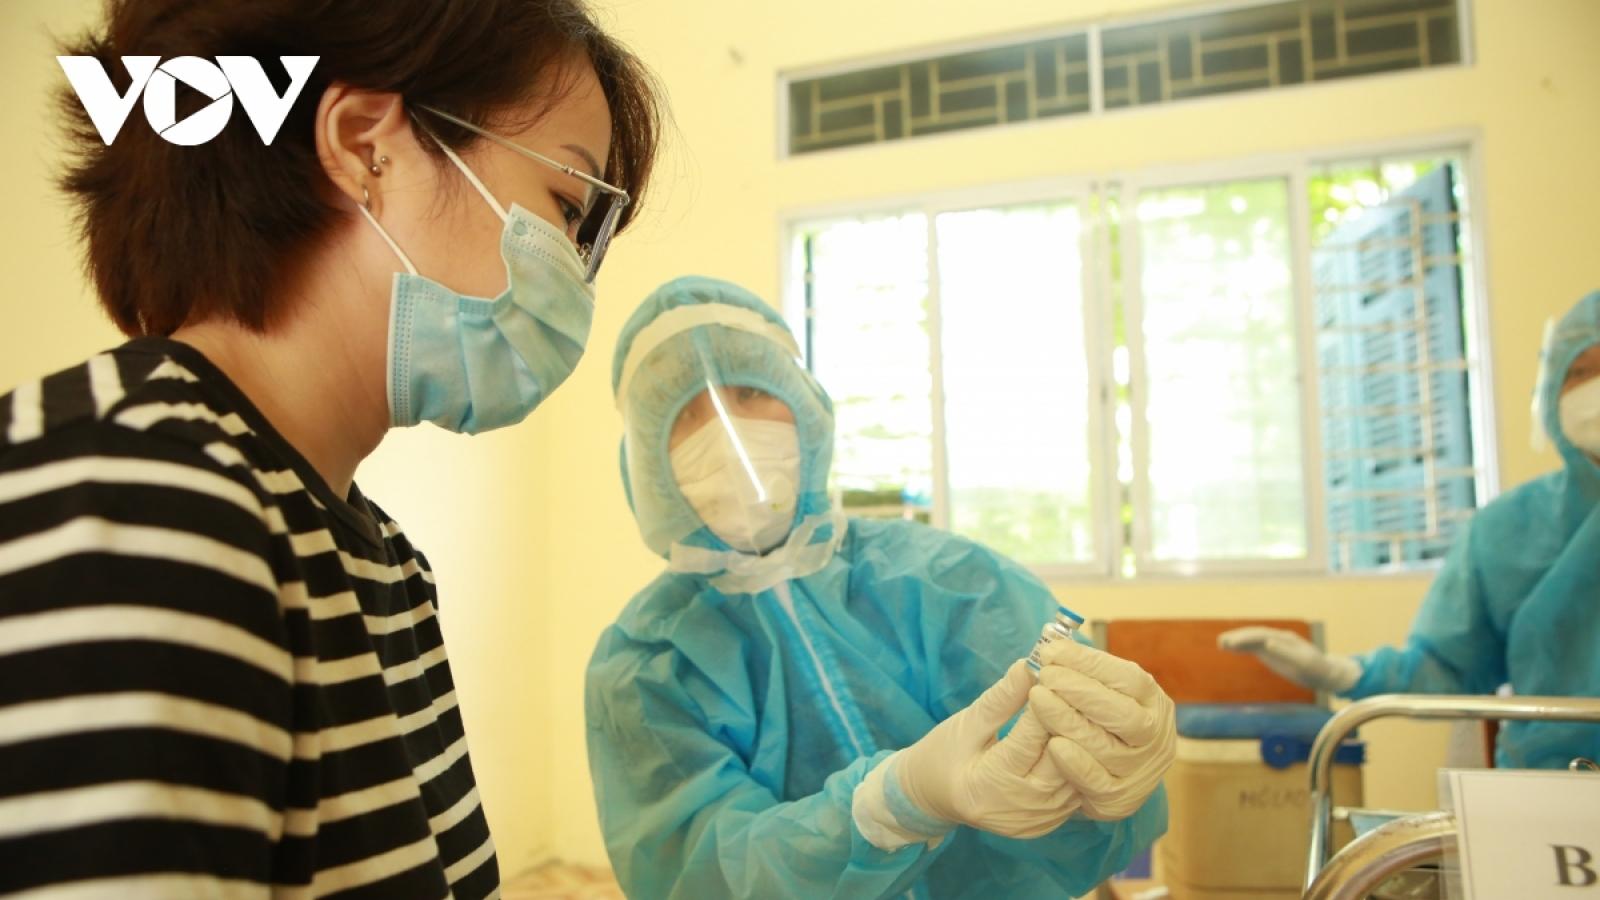 Hà Nội đã tiêm gần 5 triệu liều vaccine Covid-19